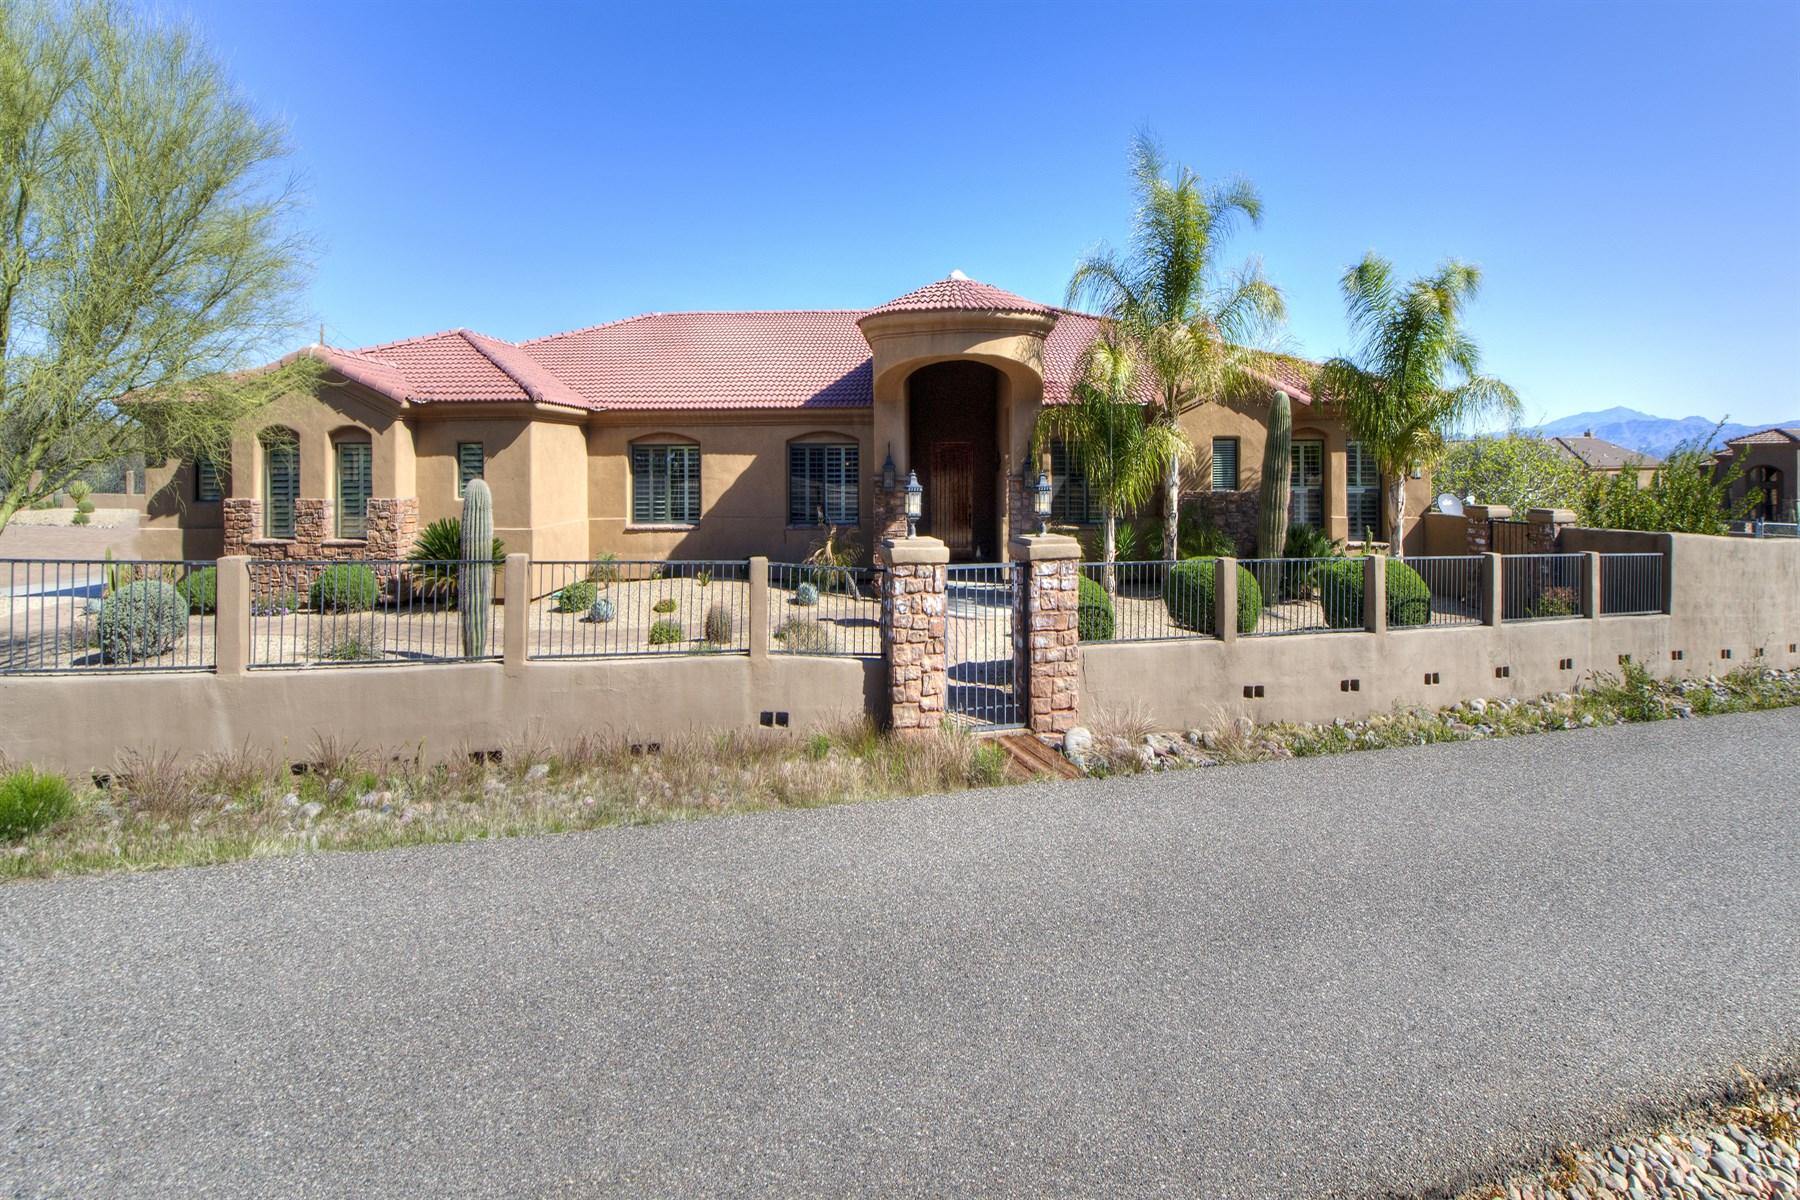 Vivienda unifamiliar por un Venta en Privately Gated Custom Tuscan Style North Scottsdale Home 28427 N 136th Street Scottsdale, Arizona 85262 Estados Unidos